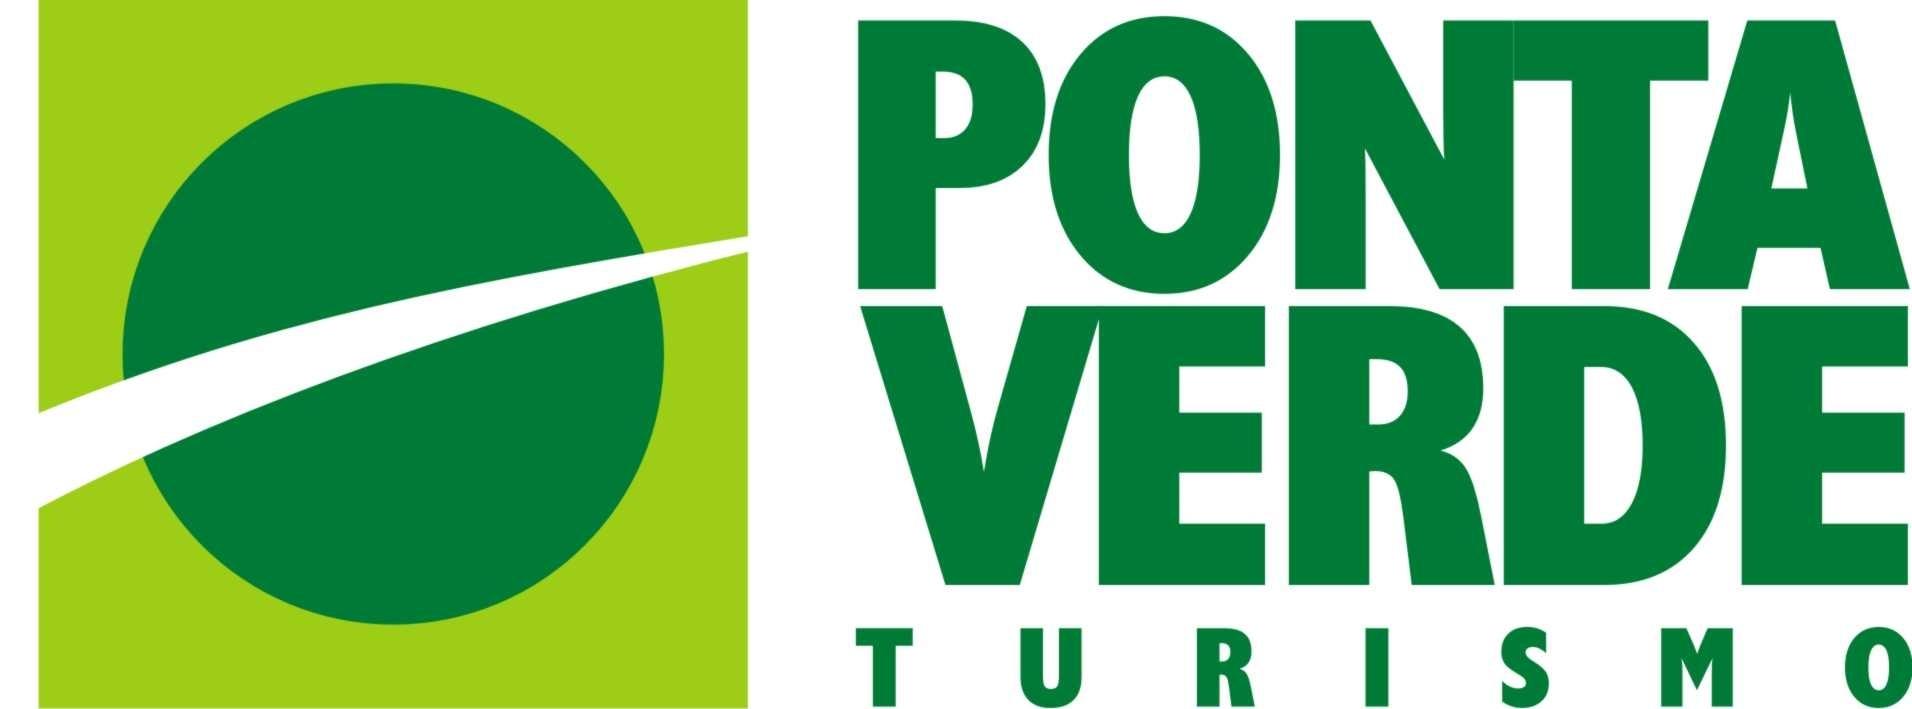 .:Ponta Verde Turismo:.